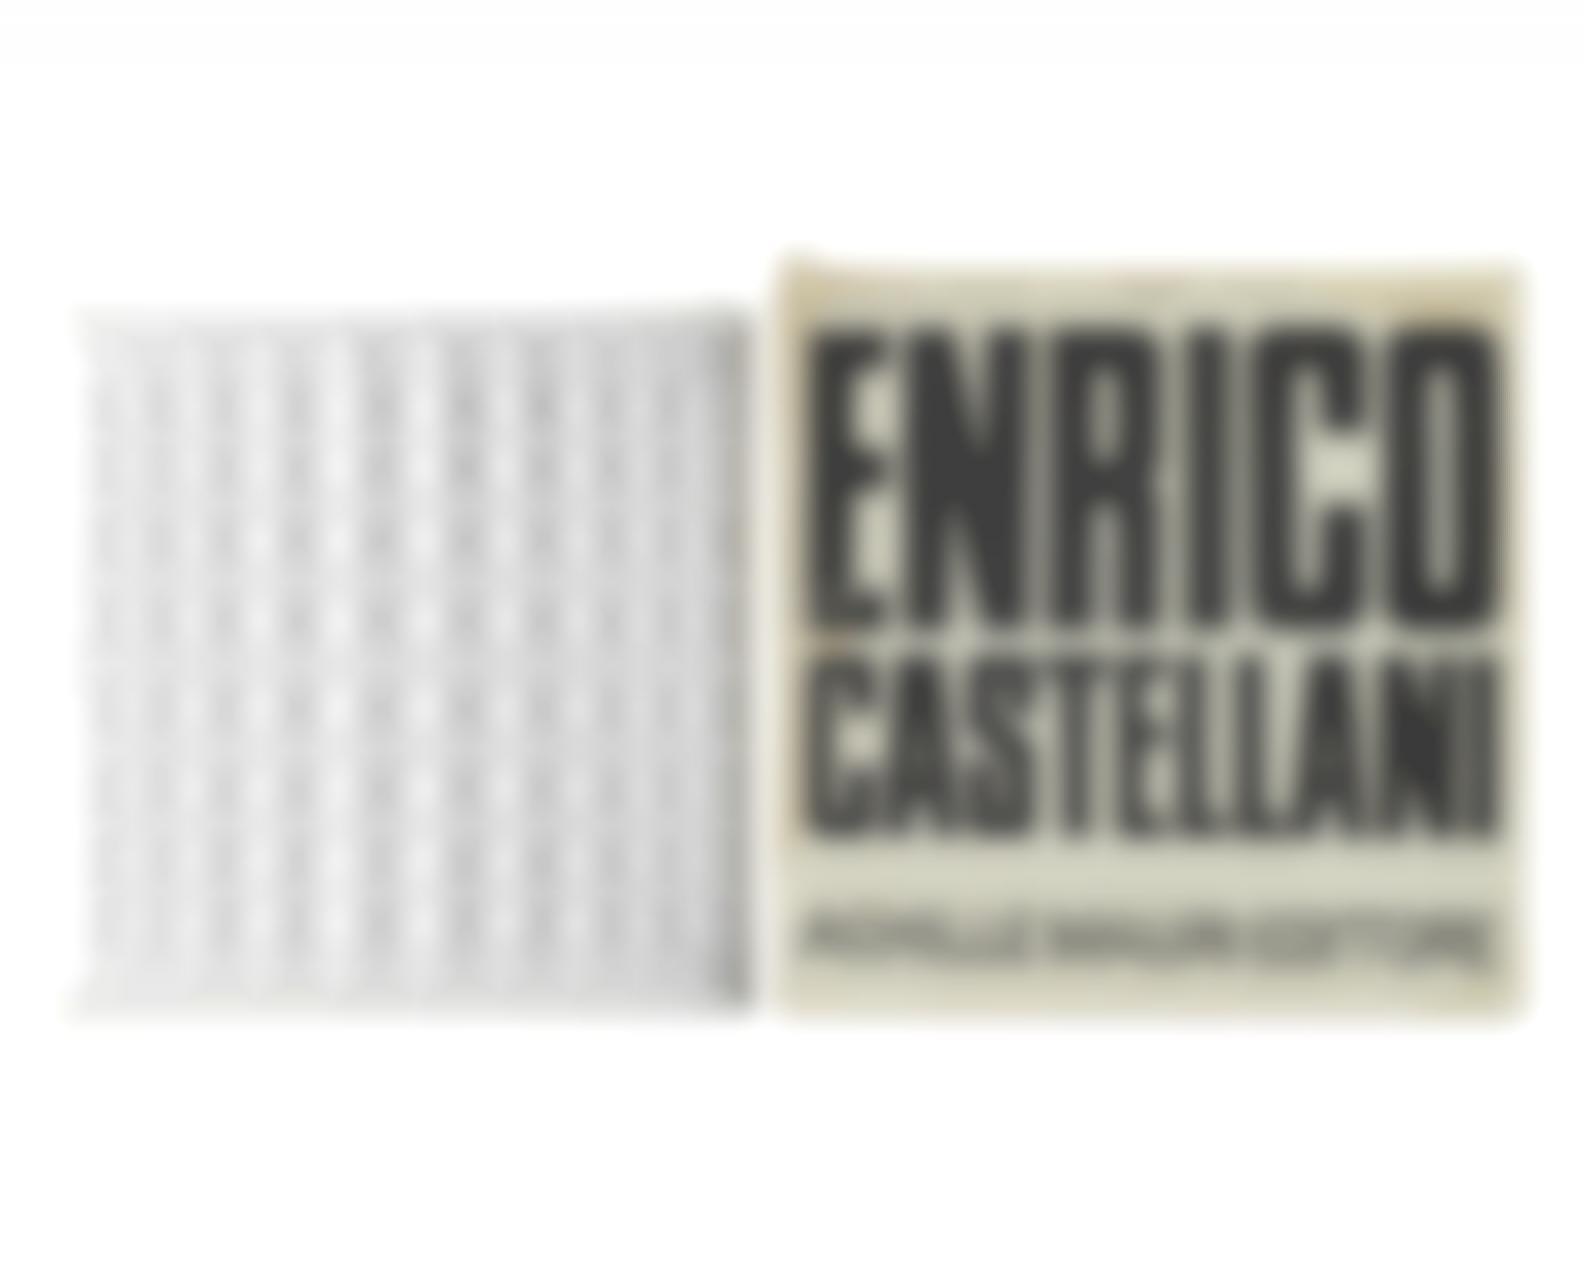 Enrico Castellani-Estroflessione-1968